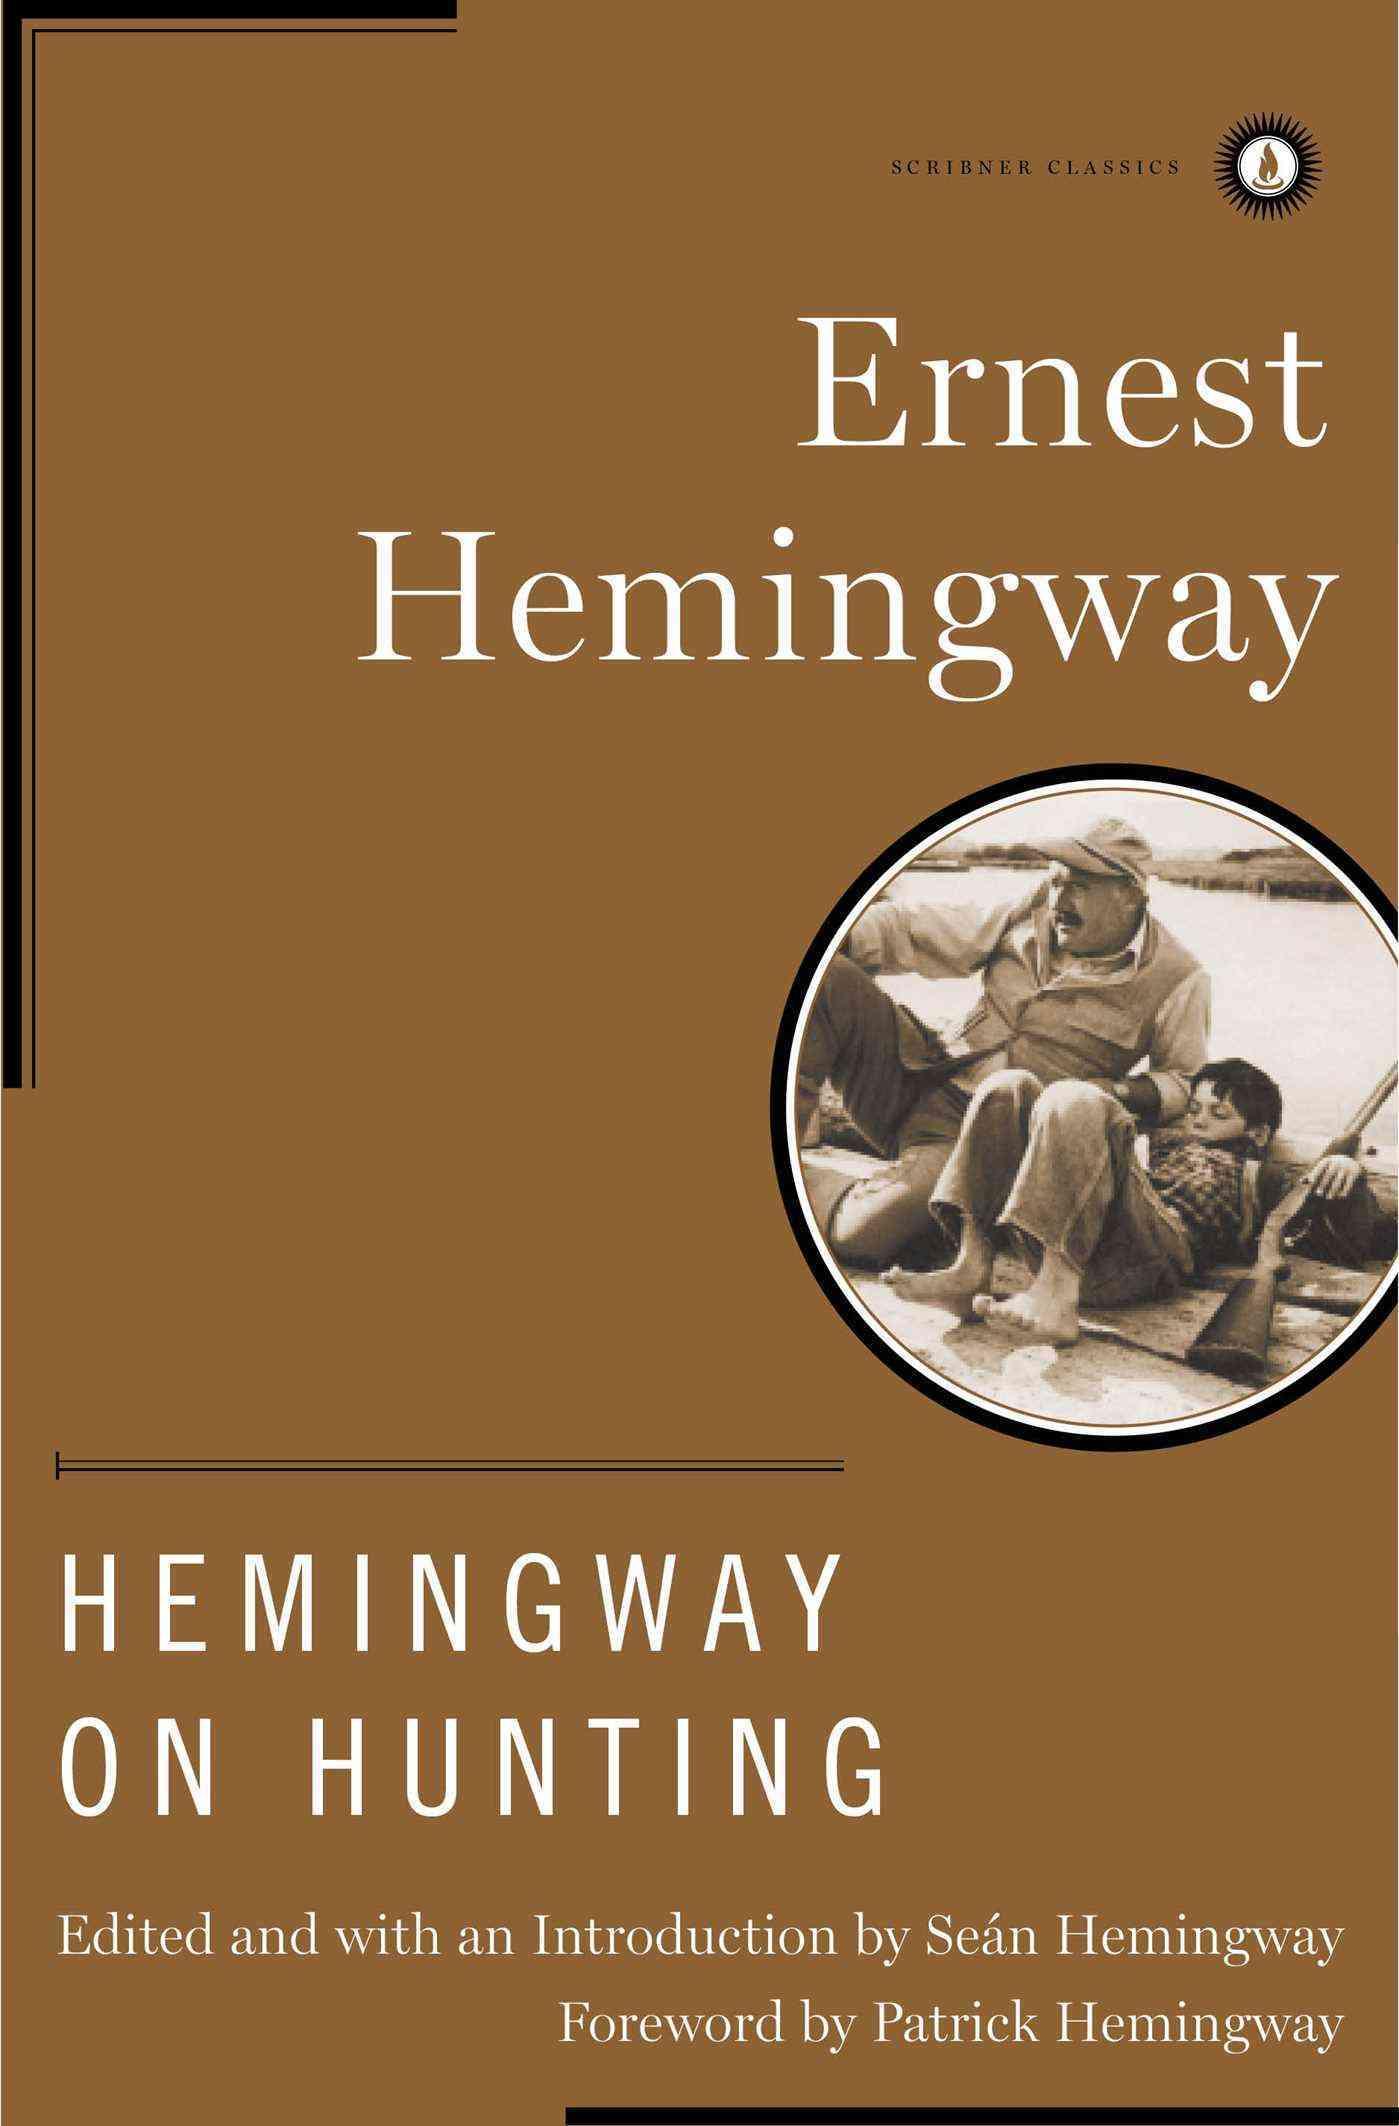 Hemingway on Hunting (Hardcover)